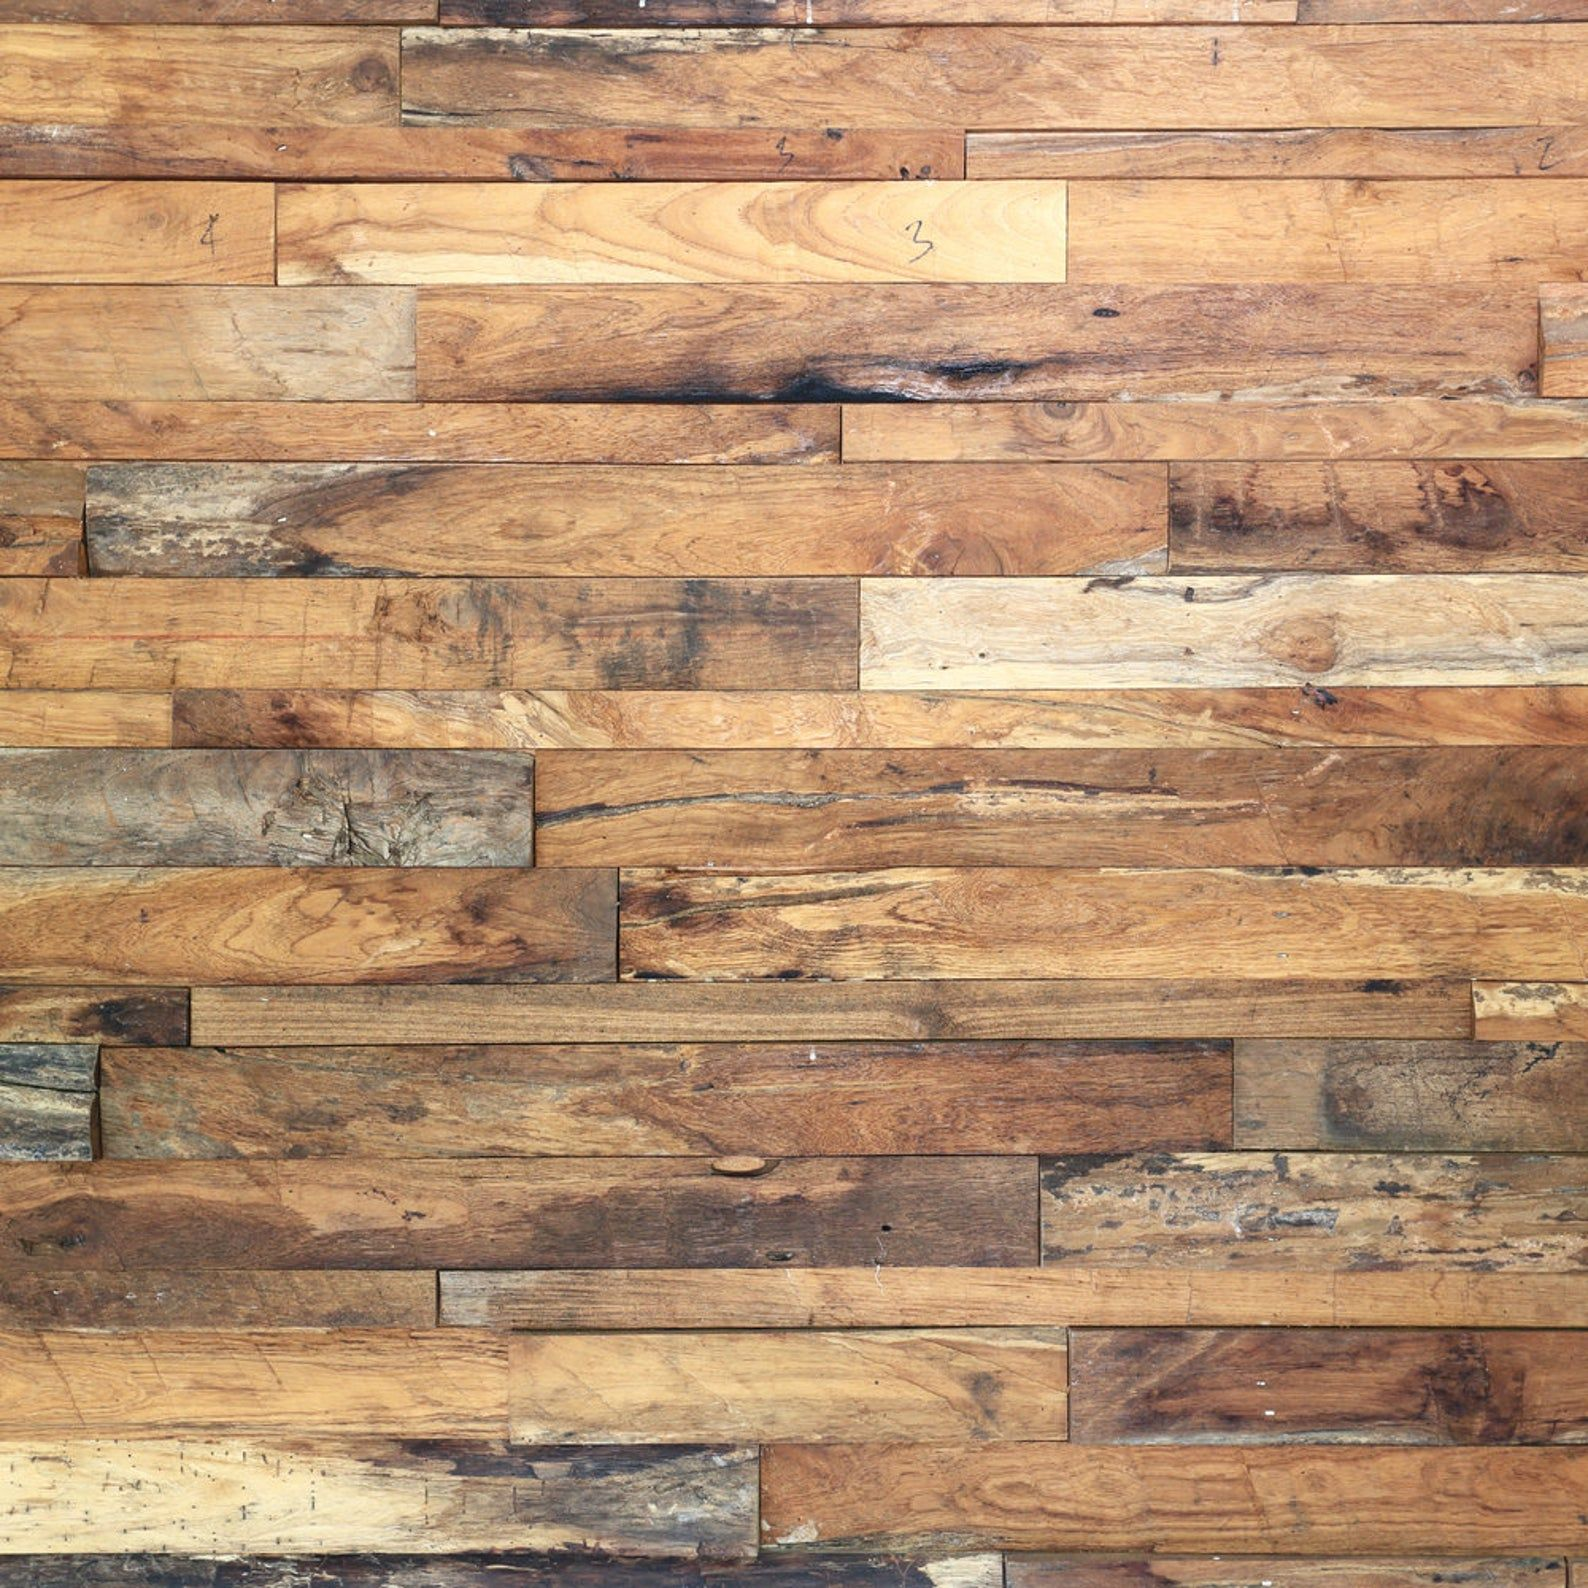 Rustic Barnwood Vintage Aged Shiplap Wood Peel And Stick Etsy Wood Wallpaper Shiplap Wood Barn Wood